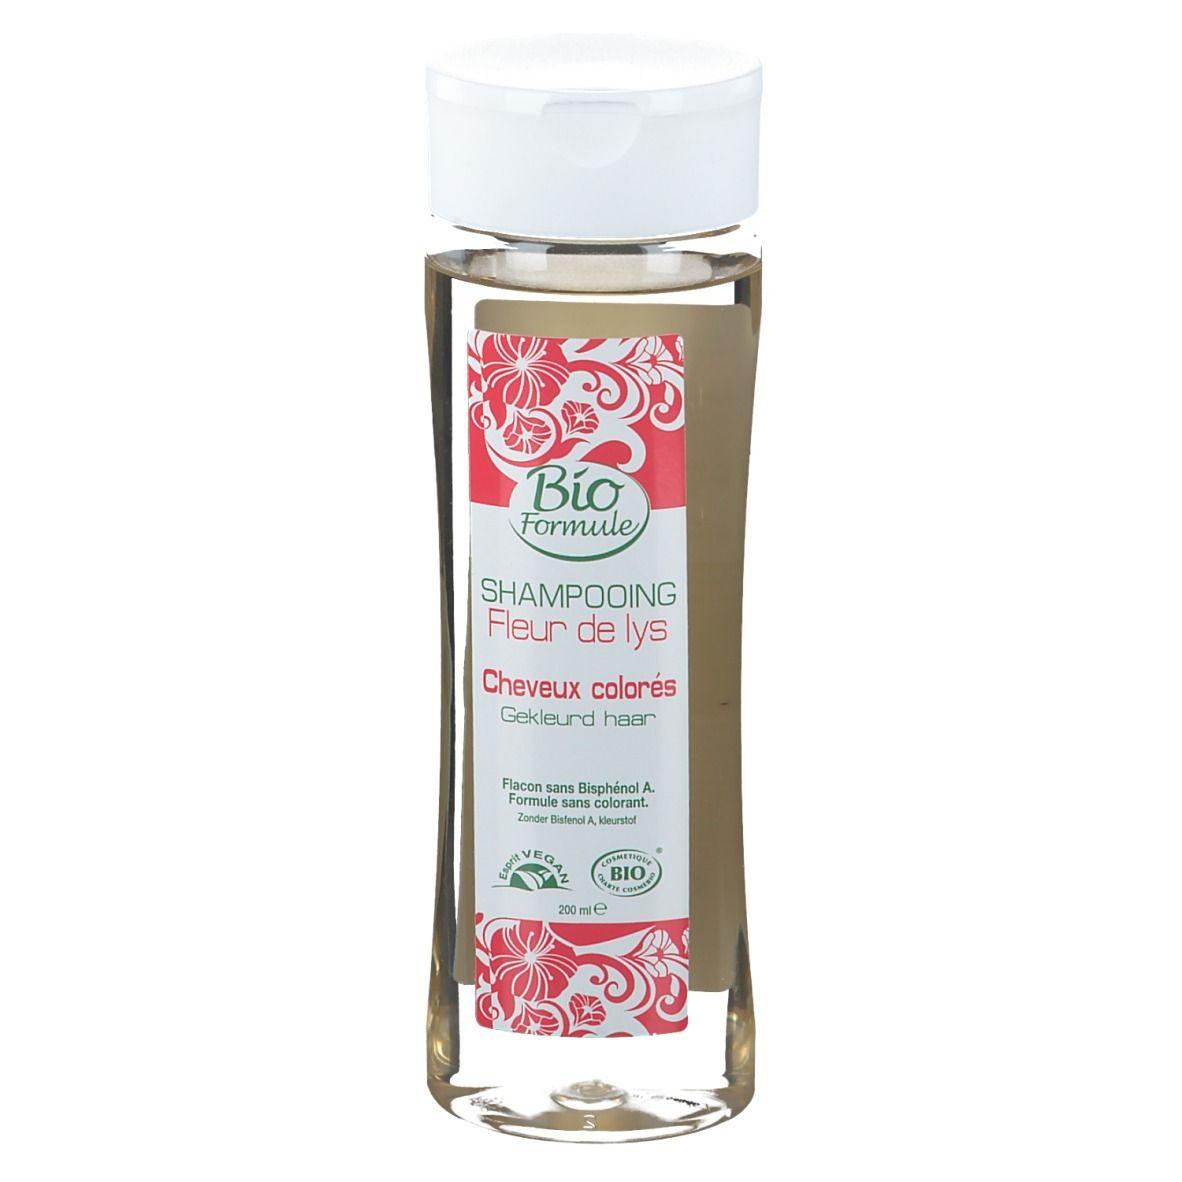 Bio Formule Shampooing Fleur de lys ml shampooing